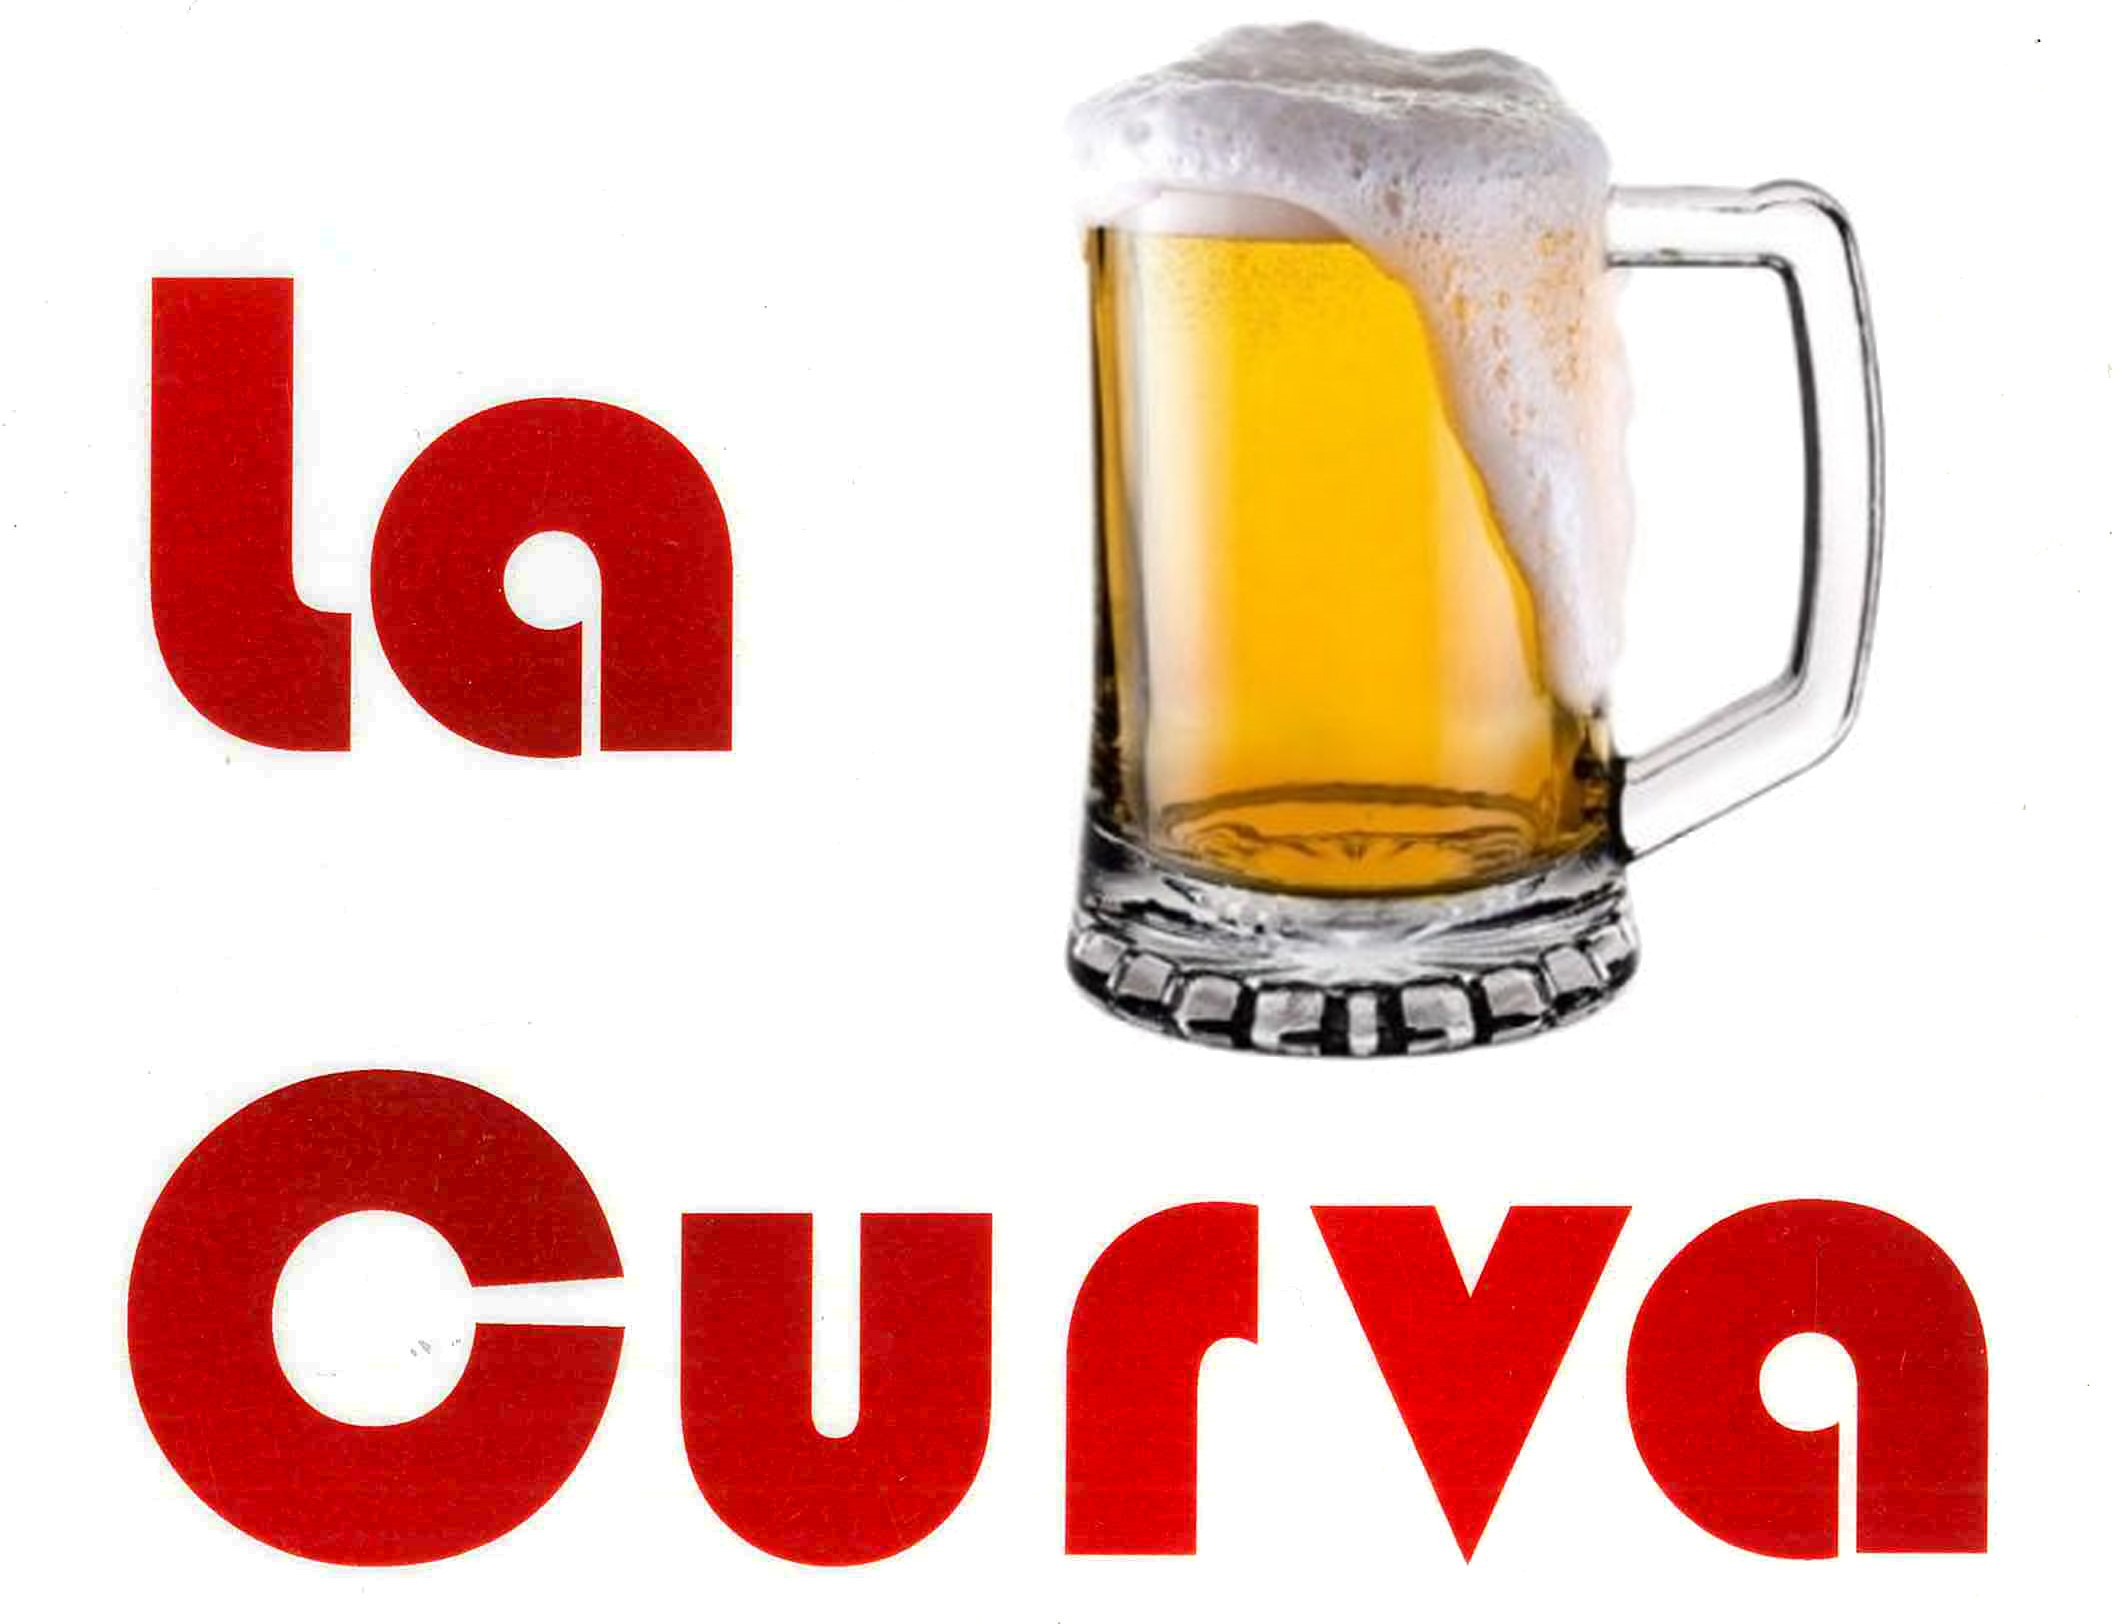 La Curva (Guadalajara)